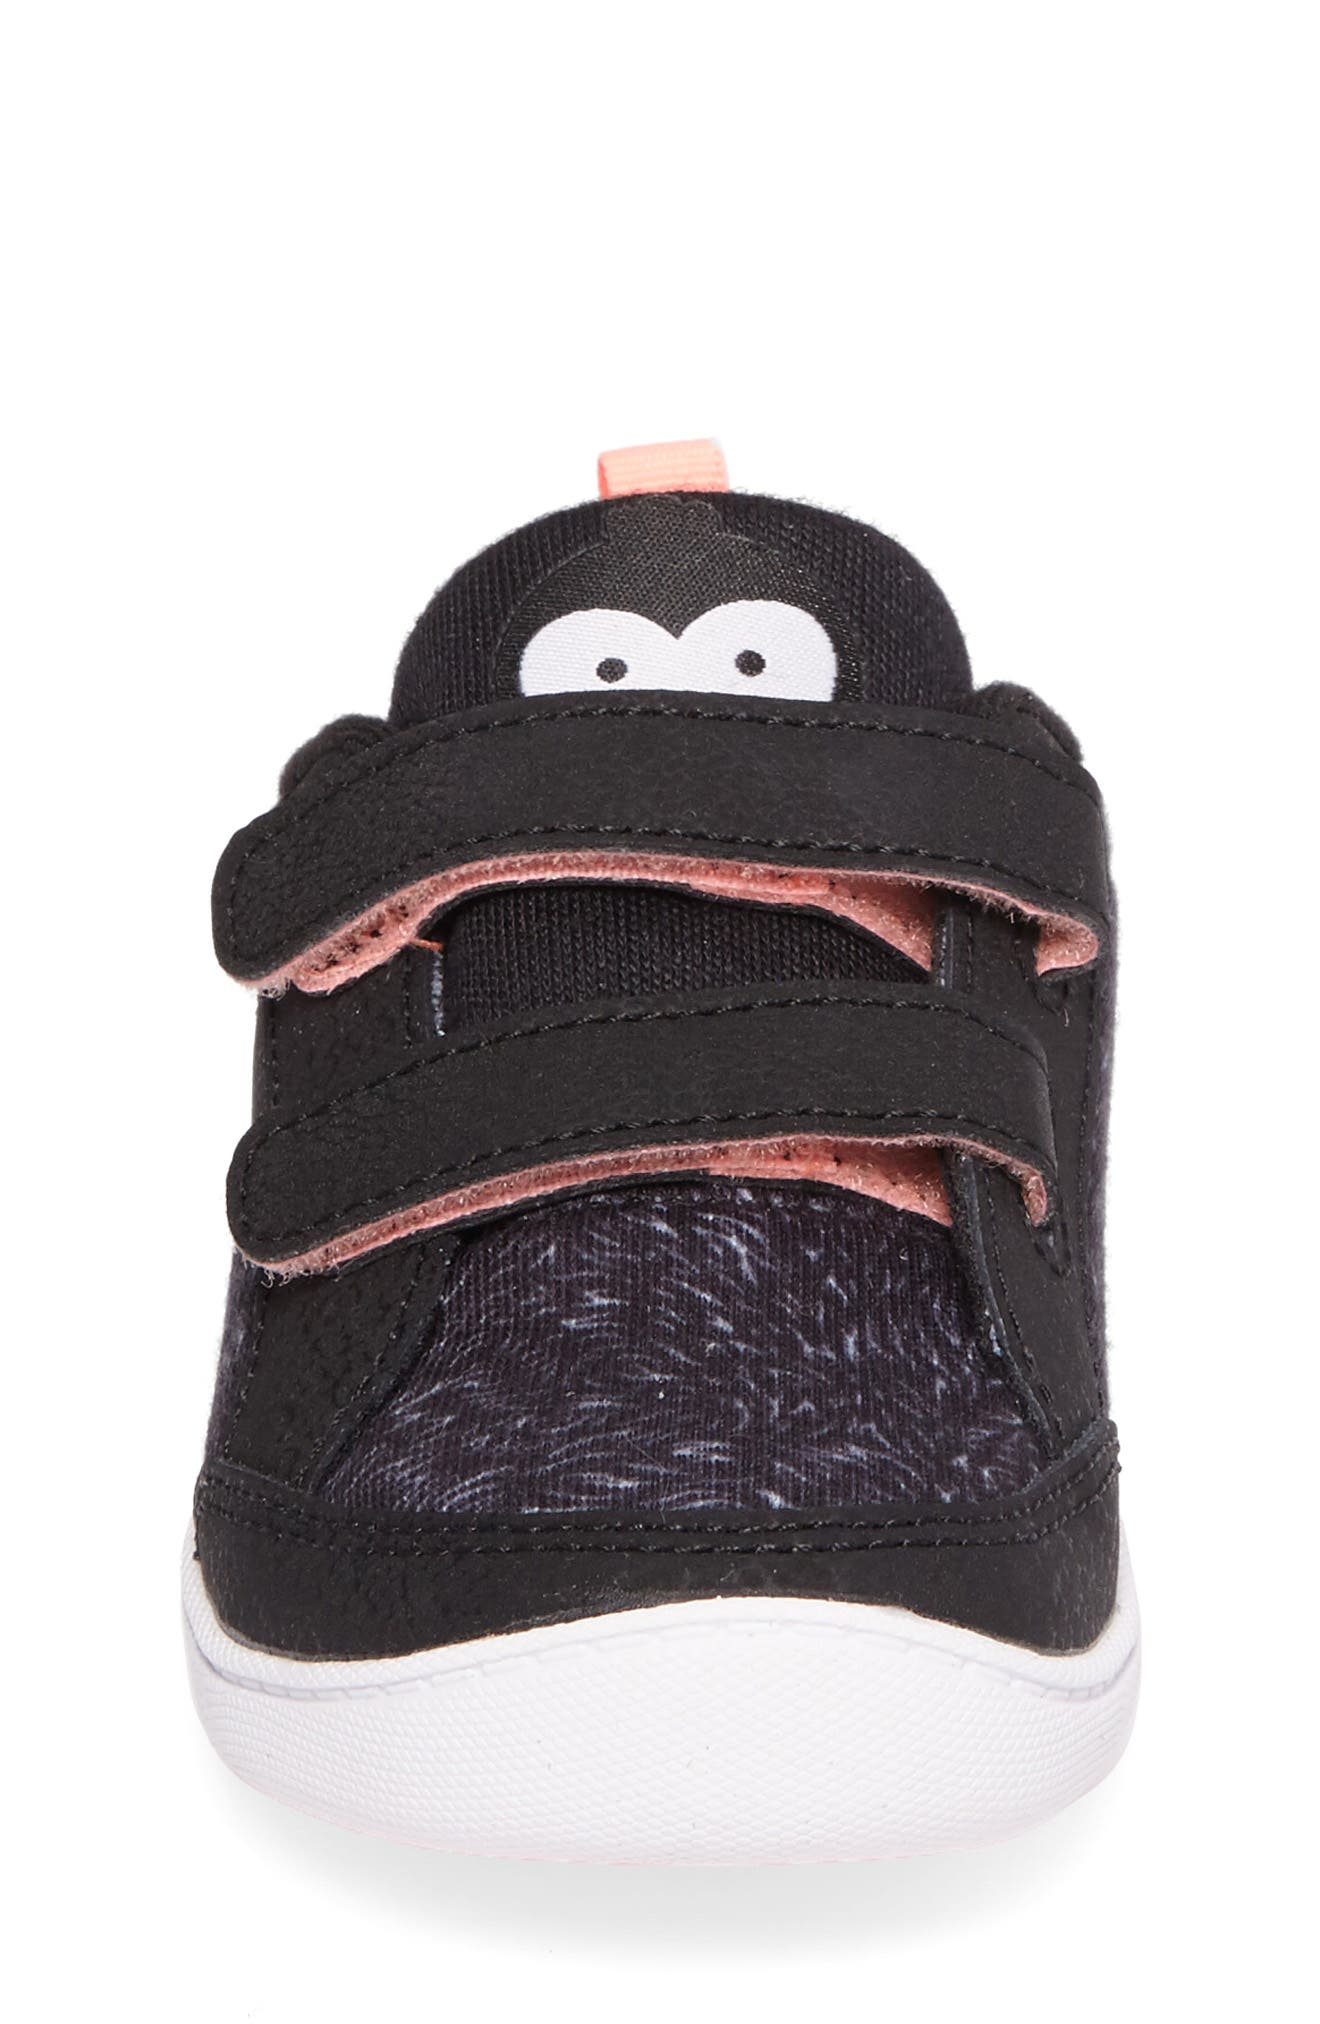 Ventureflex Critter Feet Sneaker,                             Alternate thumbnail 4, color,                             Artic Black/ White/ Sour Melon